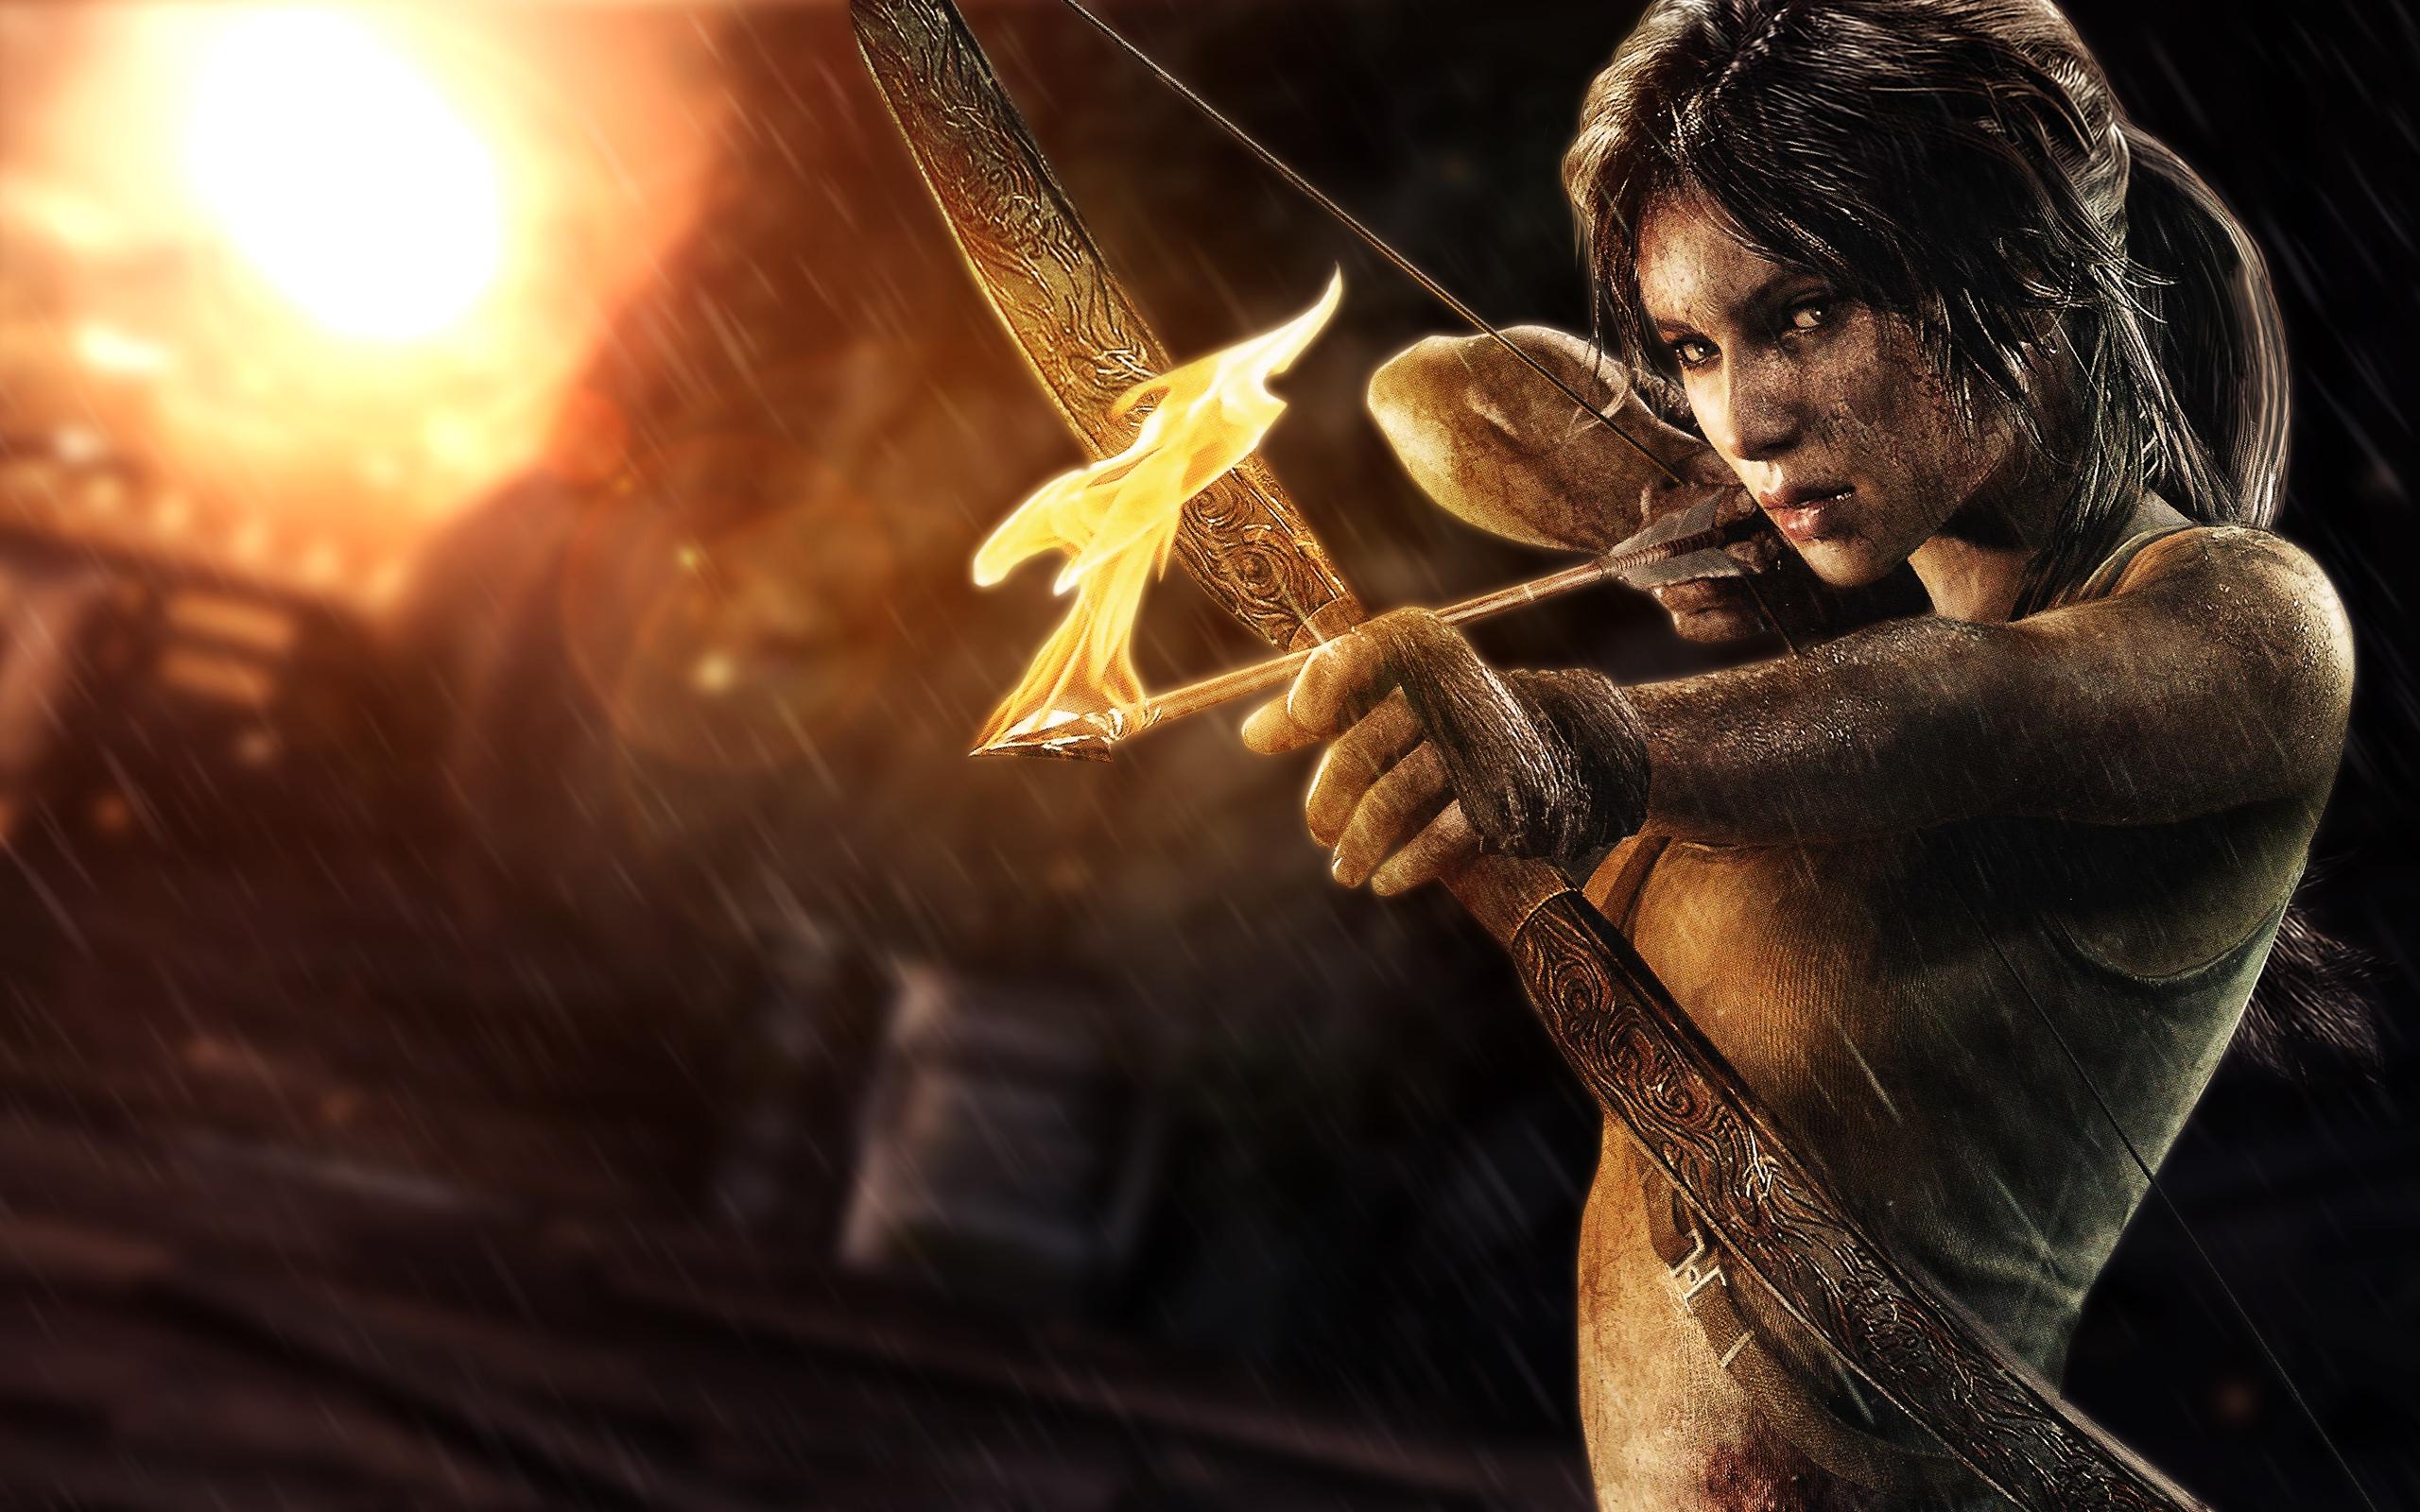 Tomb Raider Nackt Wallpaper Tomb Raider 2020 02 04